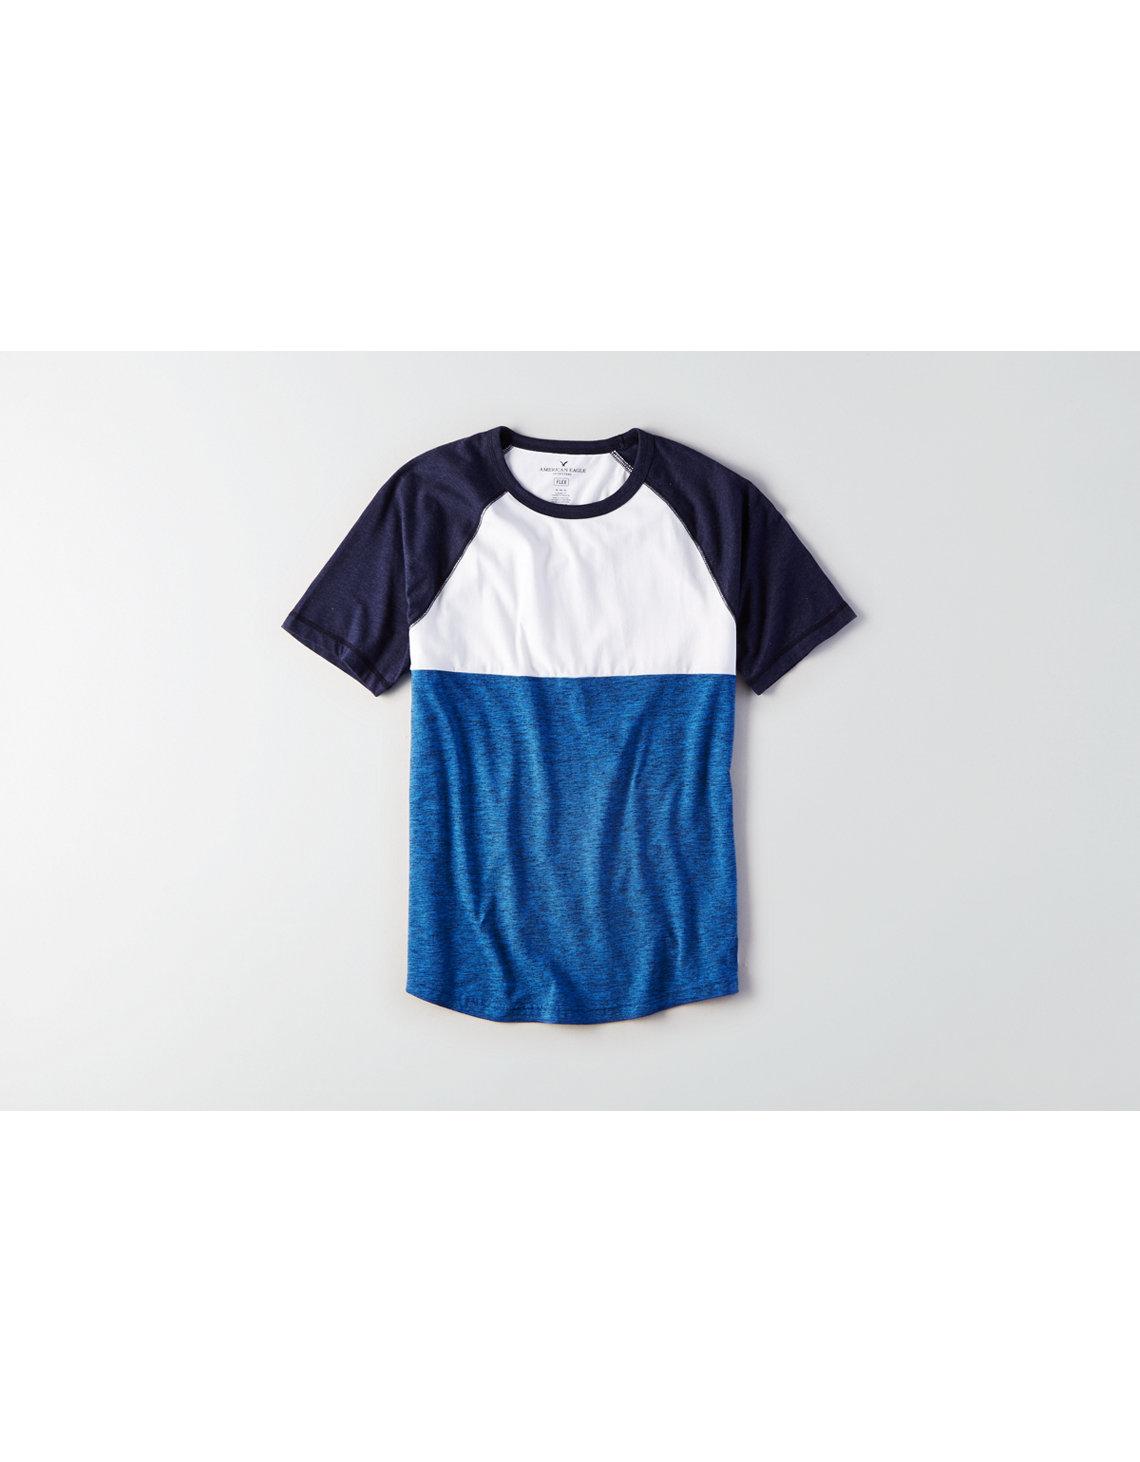 Black keys t shirt uk - Aeo Flex Colorblock T Shirt Buy 2 Get 1 Free